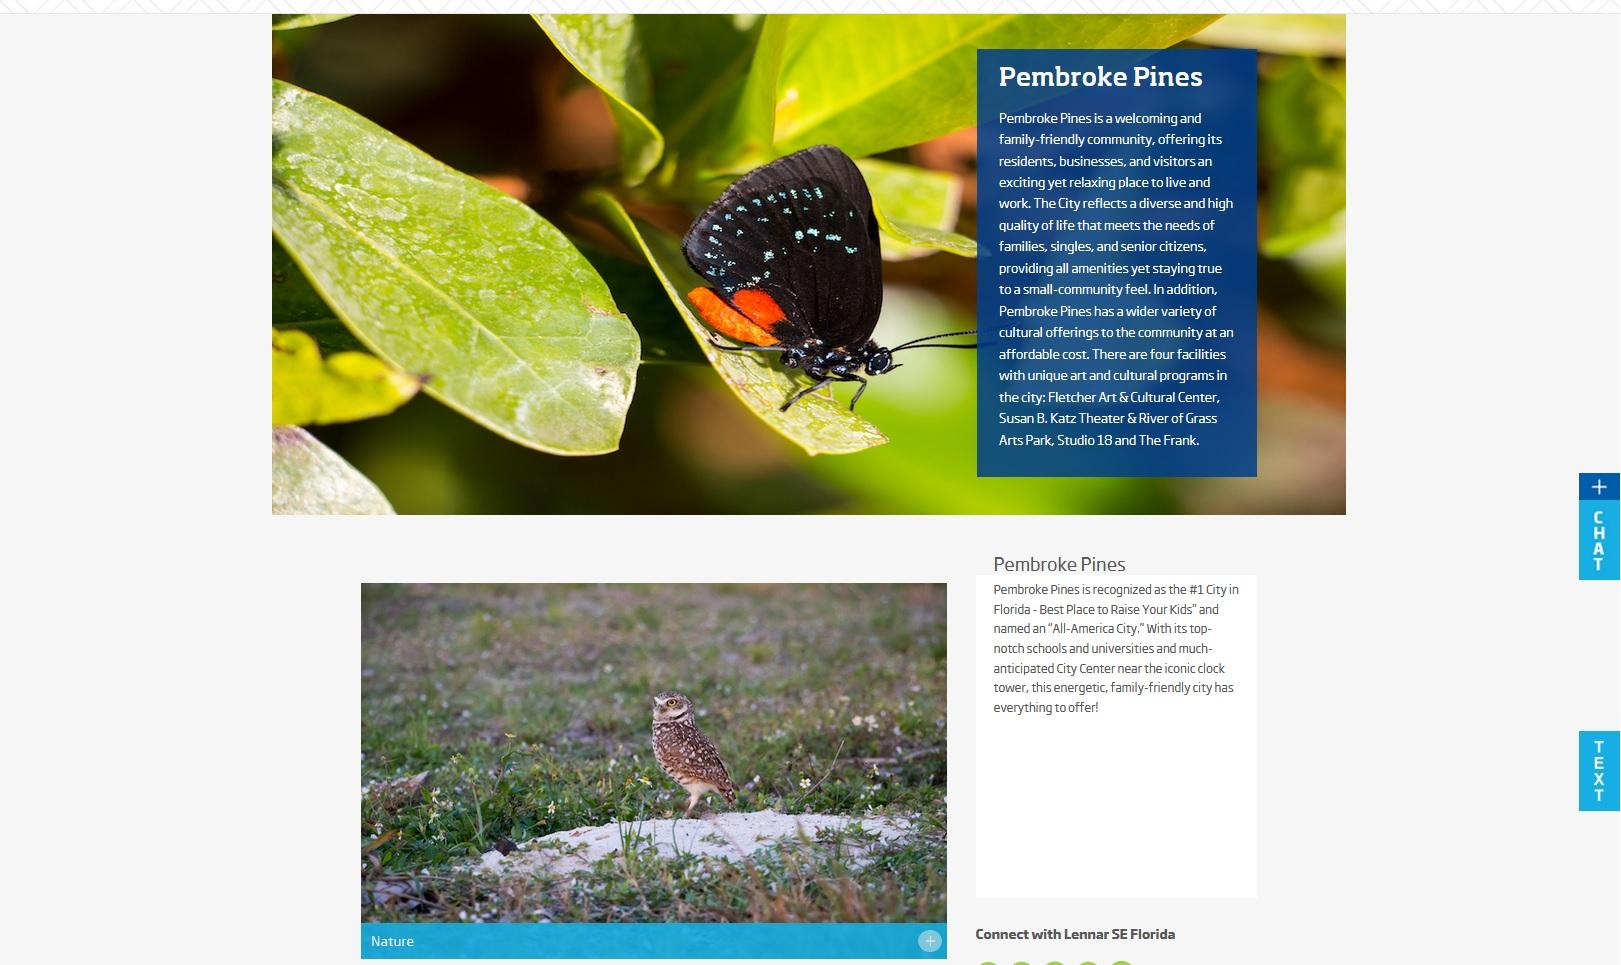 Atala butterfly & owl (Lennar real estate - Miami, Florida)